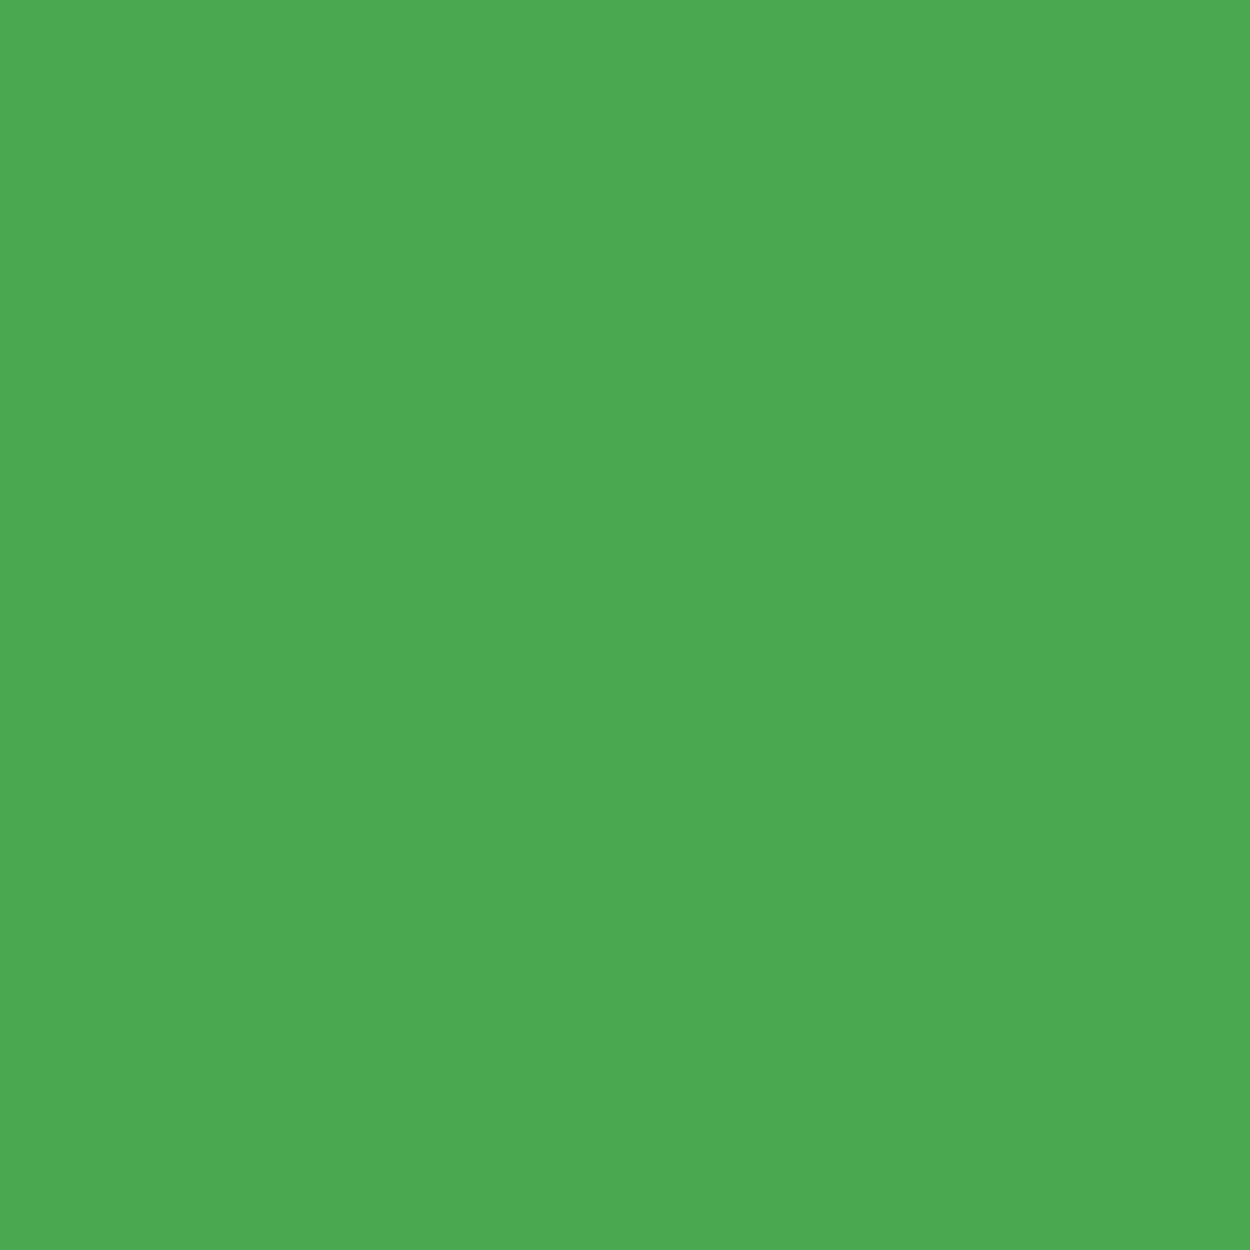 Pantone 361 C   HEX: #4AA74F   RGB: 74, 167, 79   CMYK: 56, 0, 53, 35